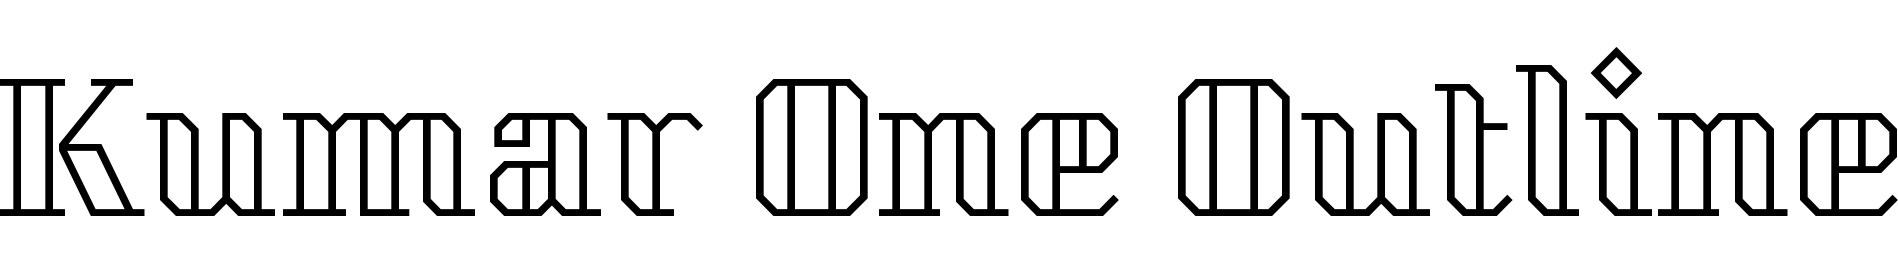 Kumar One Outline